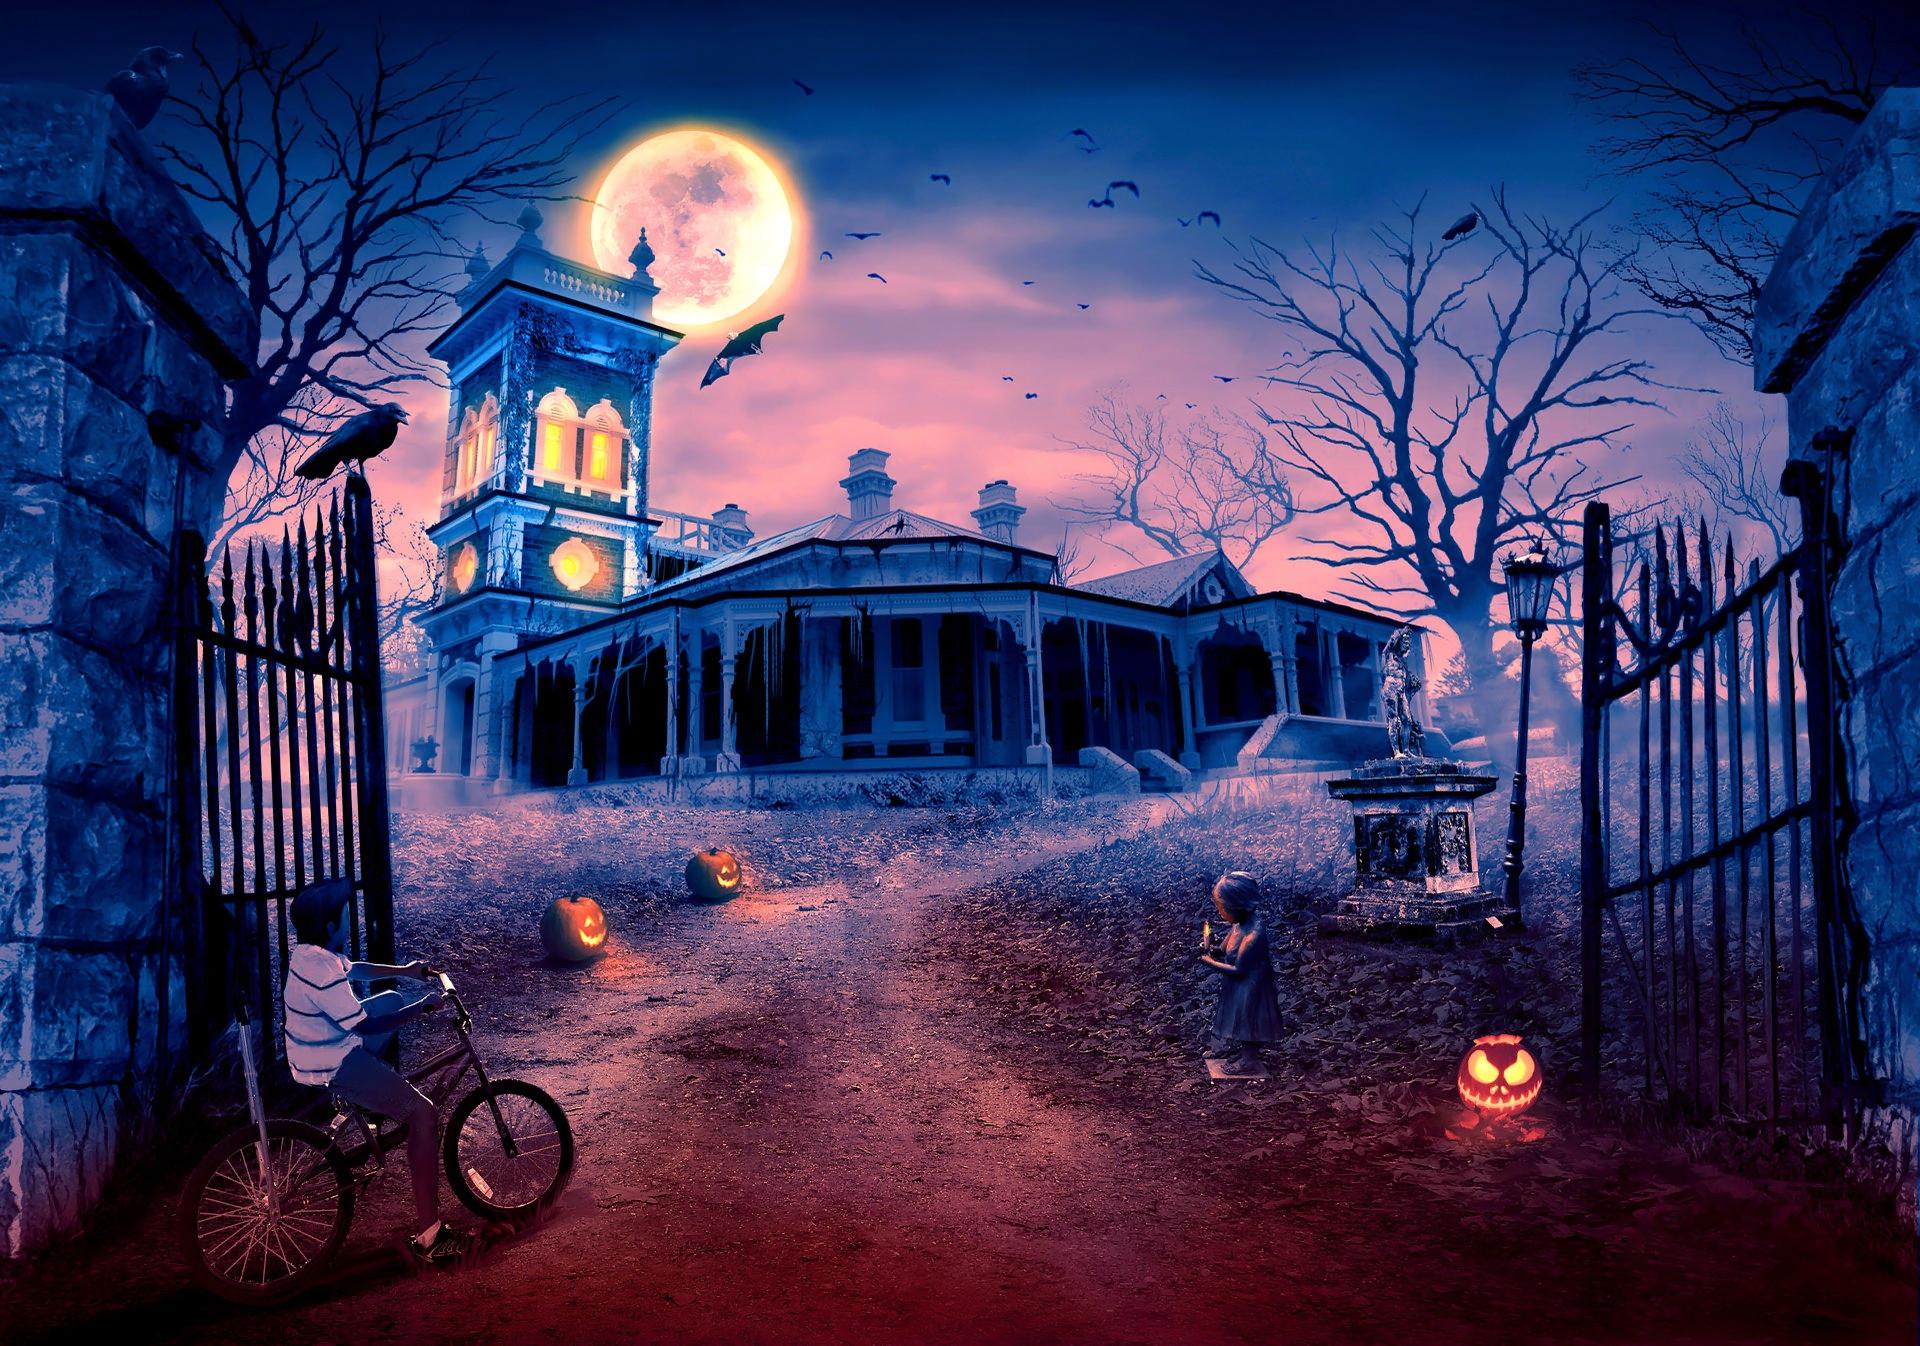 Bat Halloween Haunted House Holiday Jack O 039 Lantern Little Girl Moon Raven Scary 1920x1346